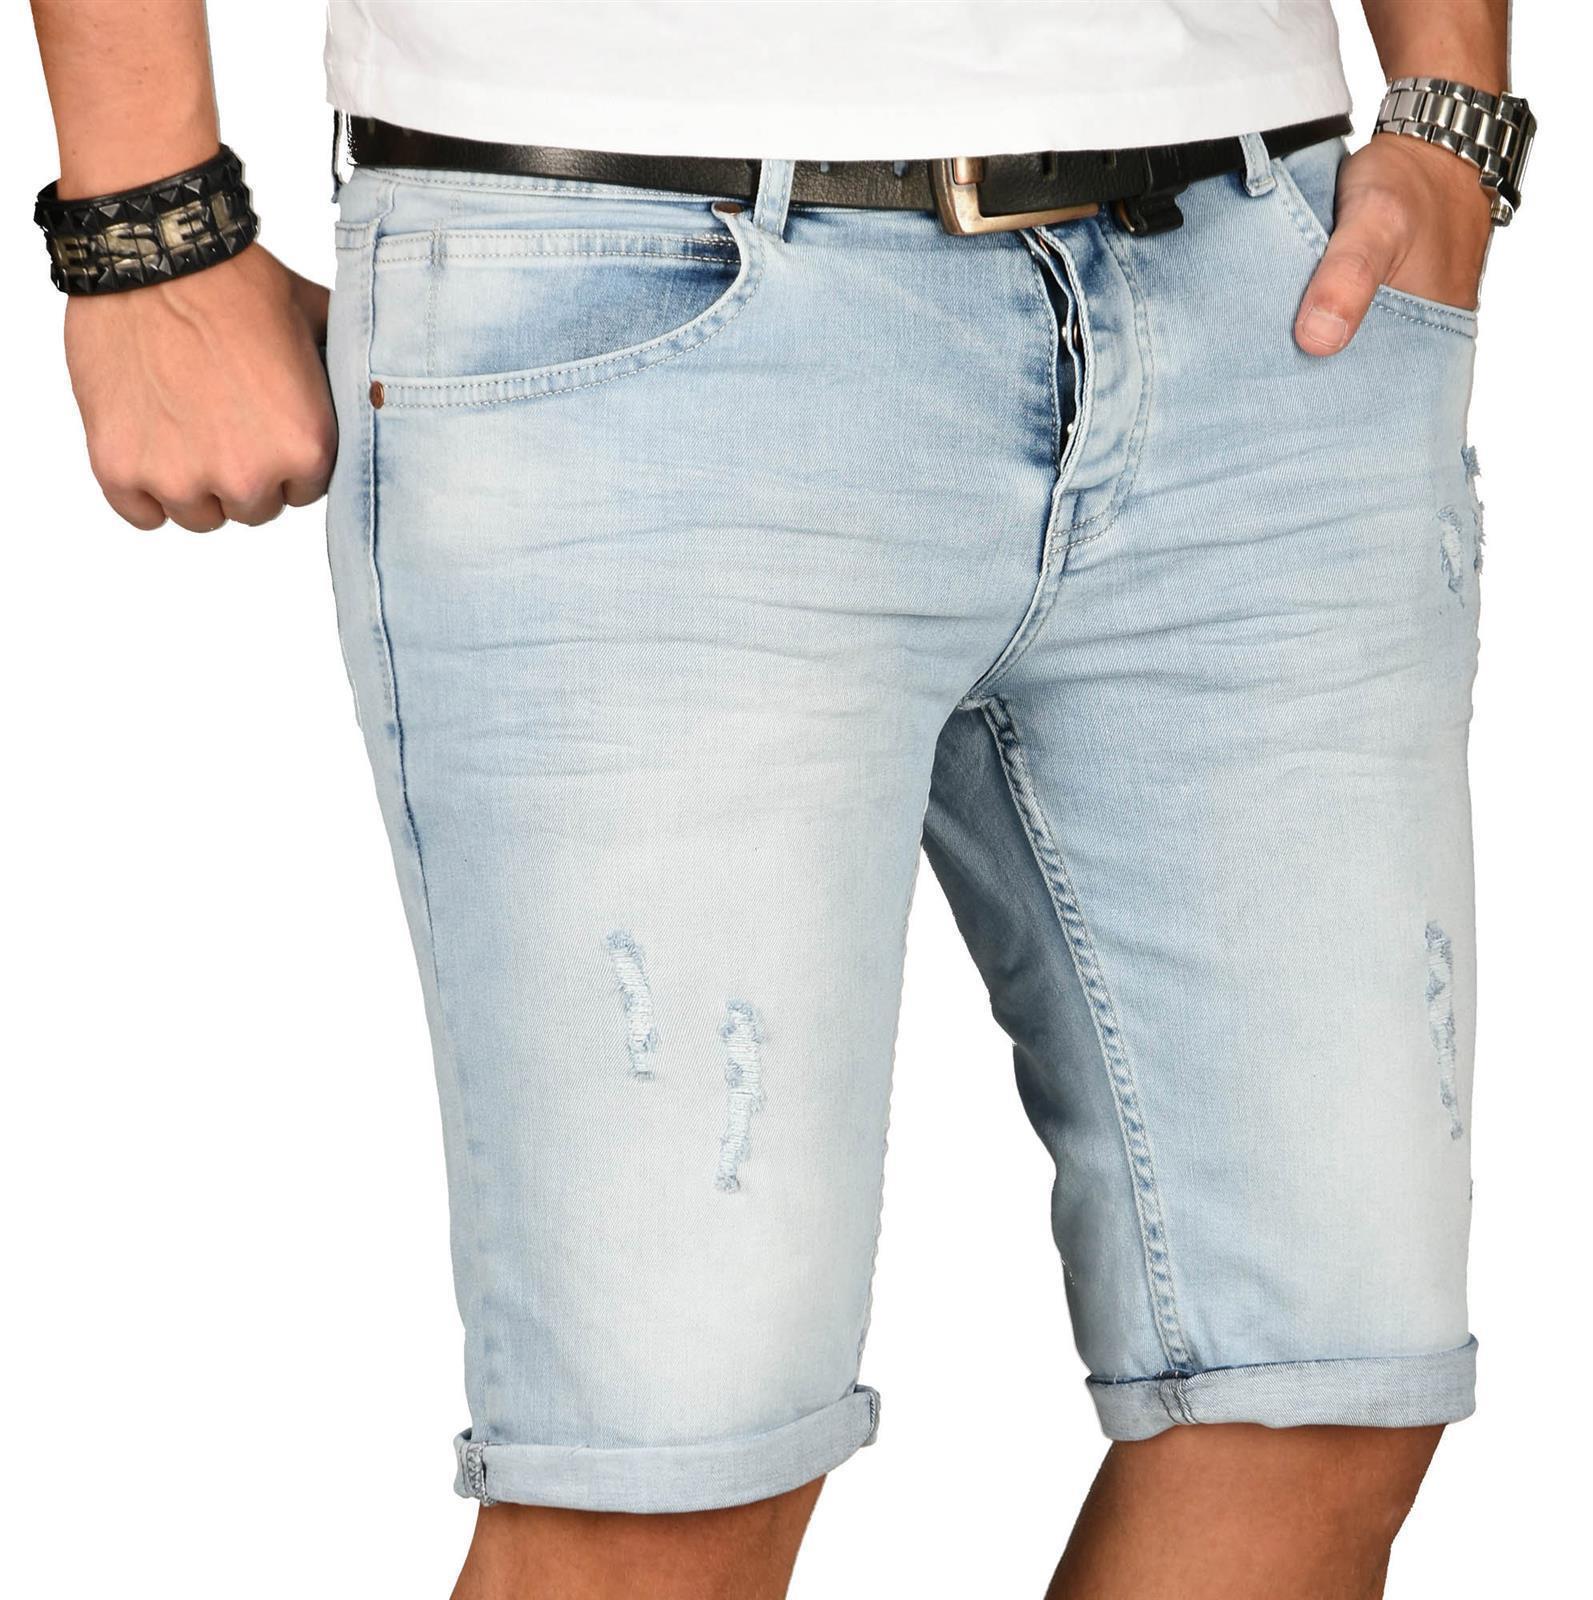 A-Salvarini-Herren-Designer-Jeans-Short-kurze-Hose-Slim-Sommer-Shorts-Washed Indexbild 7